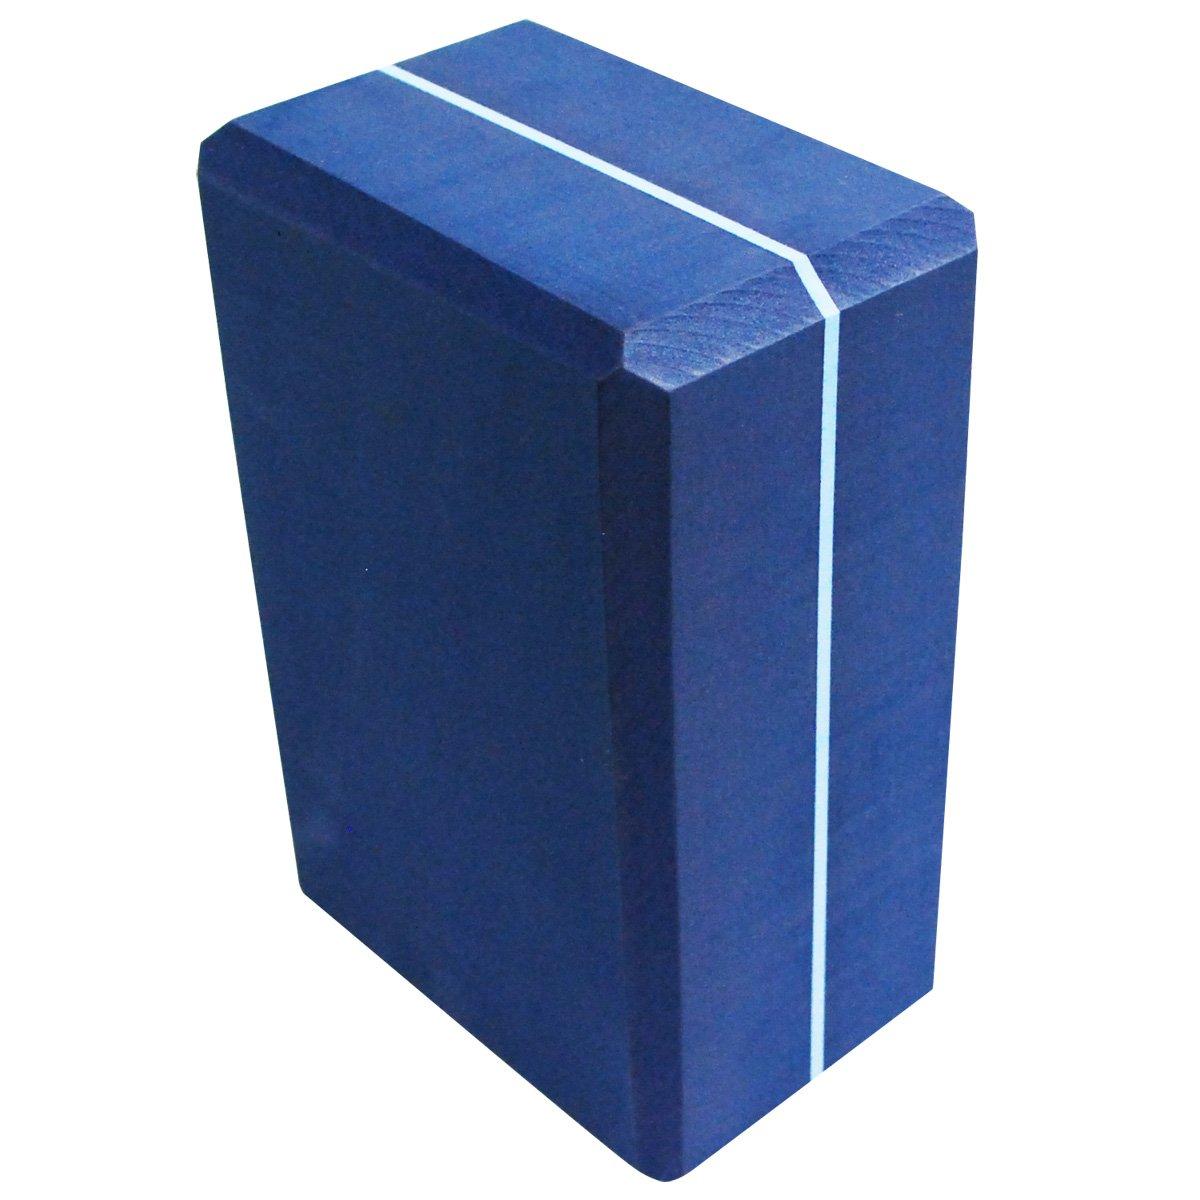 Blue, 4X6X9-Inch A241BLKBLUS4 Yoga Direct Striped Foam Block